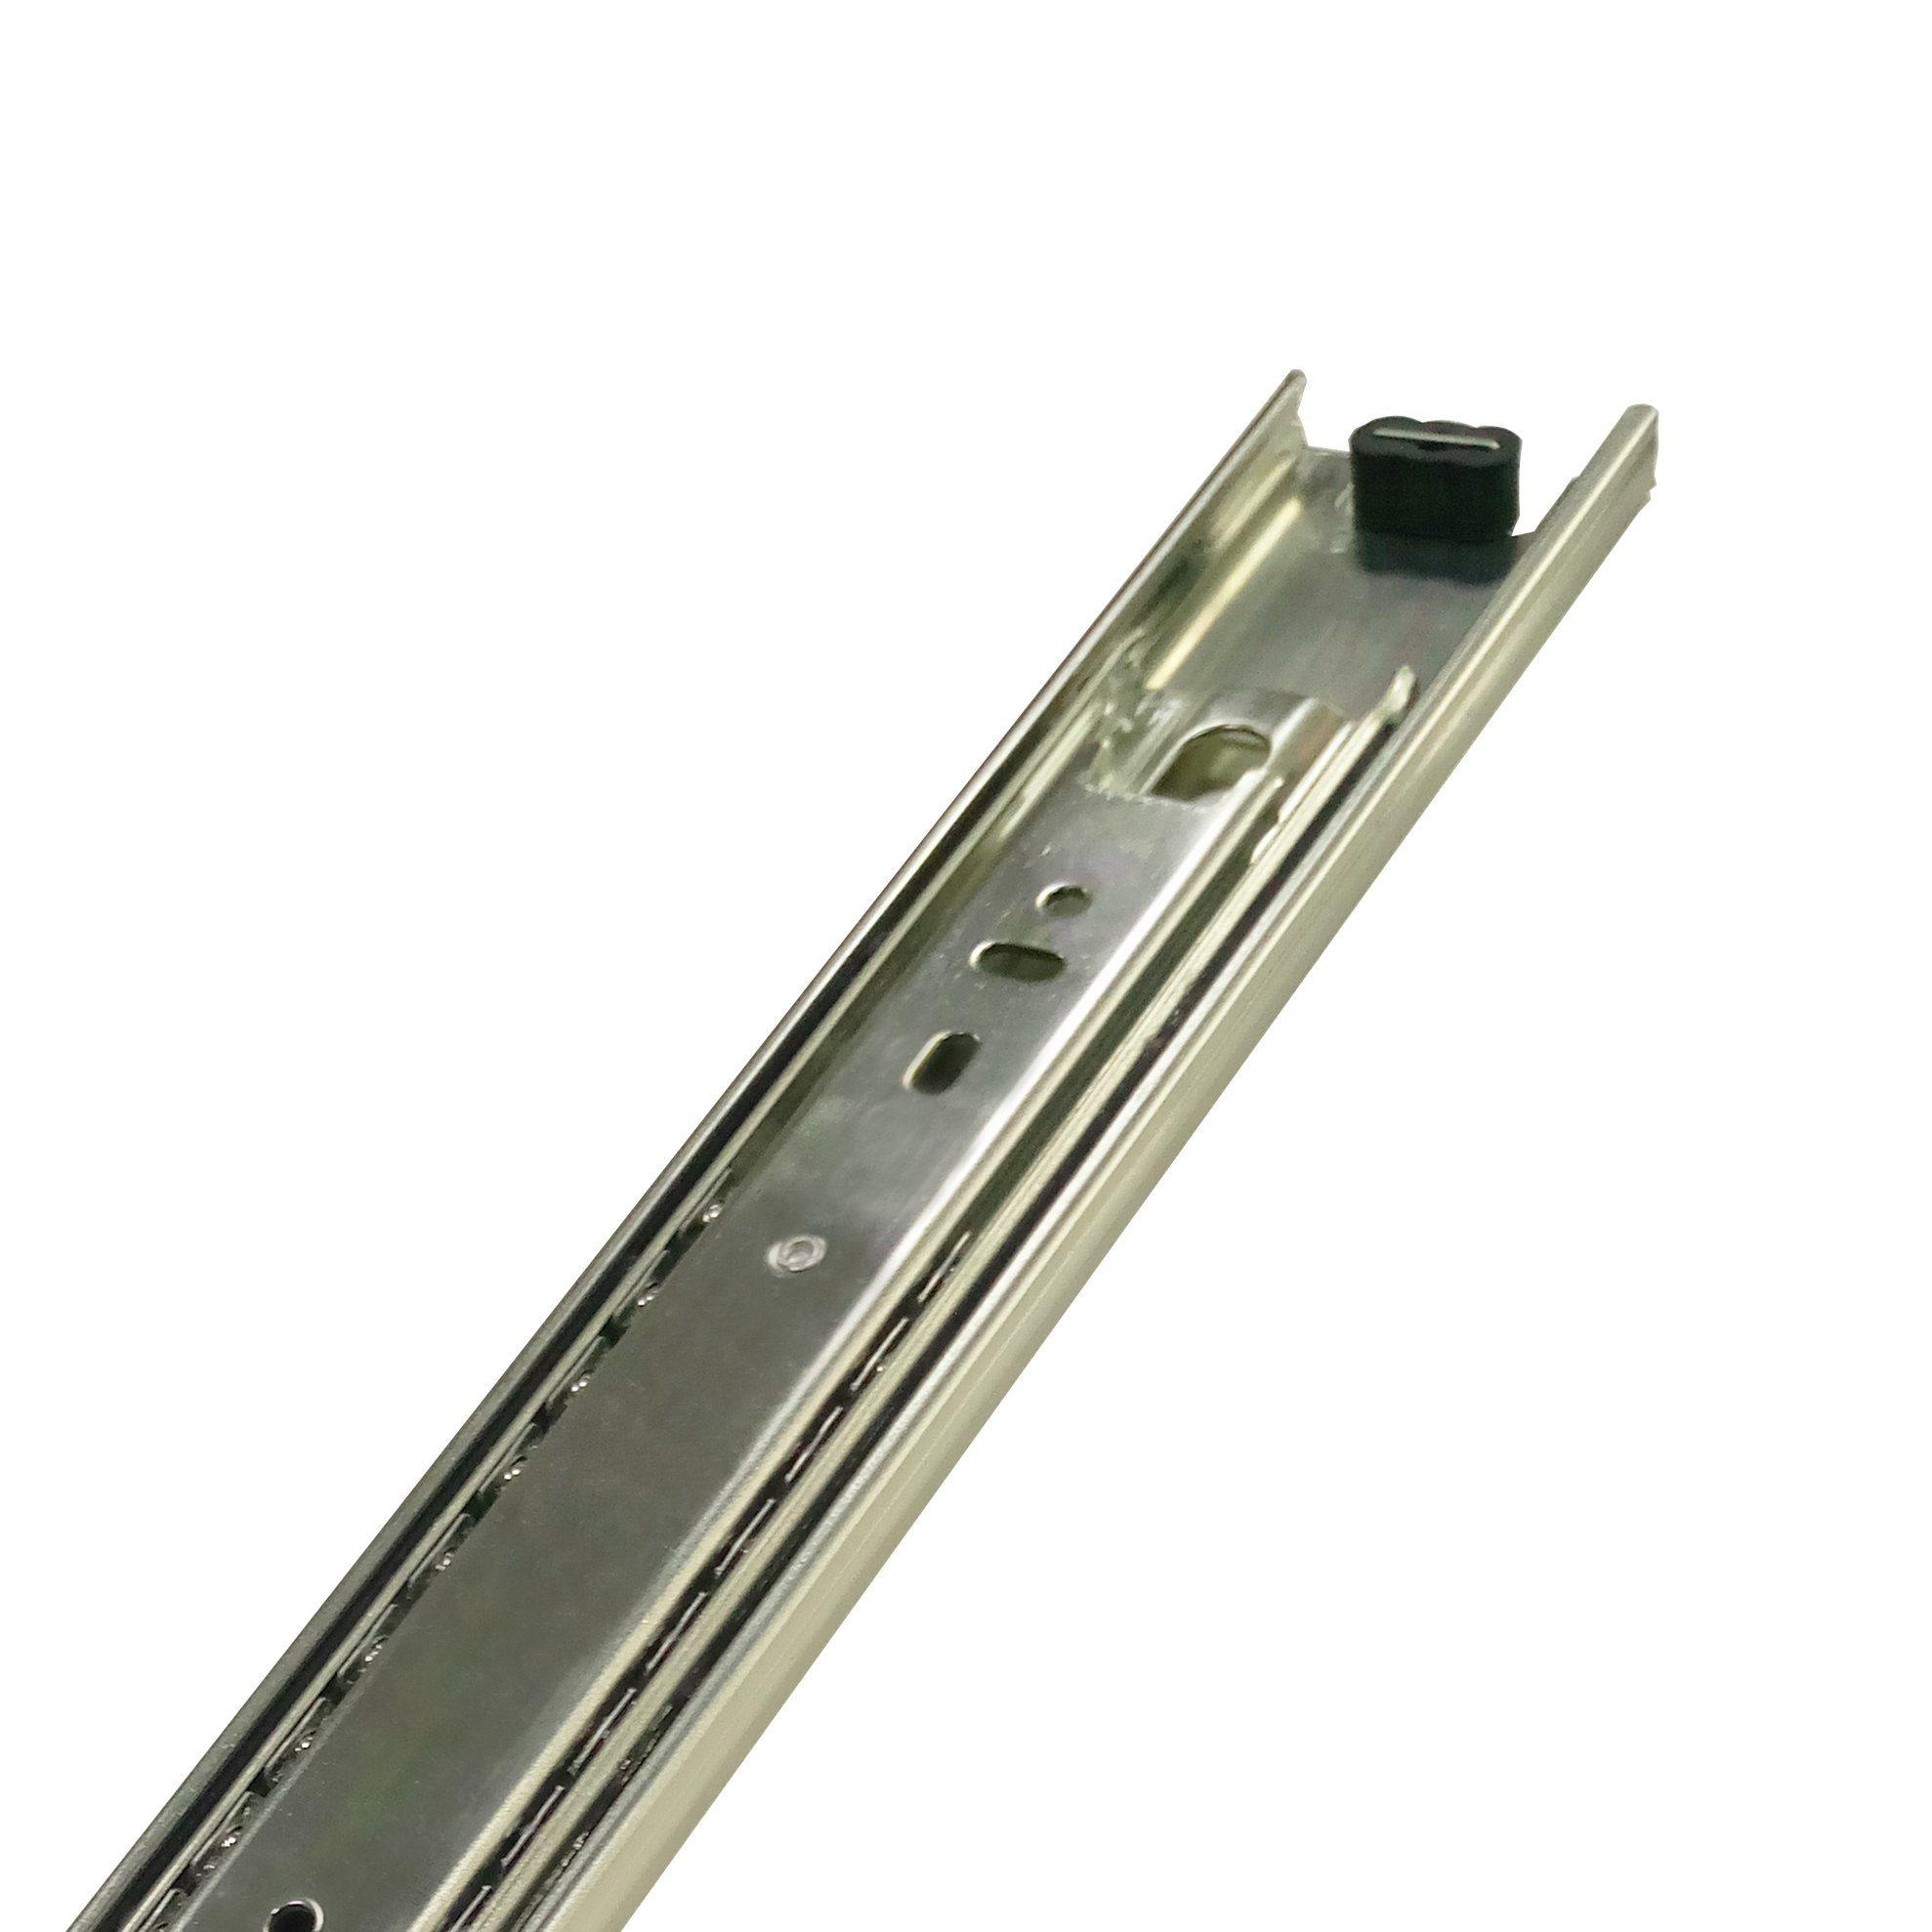 china industrial drawer furniture hqmjpkwocfaq bearing ball slide duty rail slides of heavy accessorydrawer product